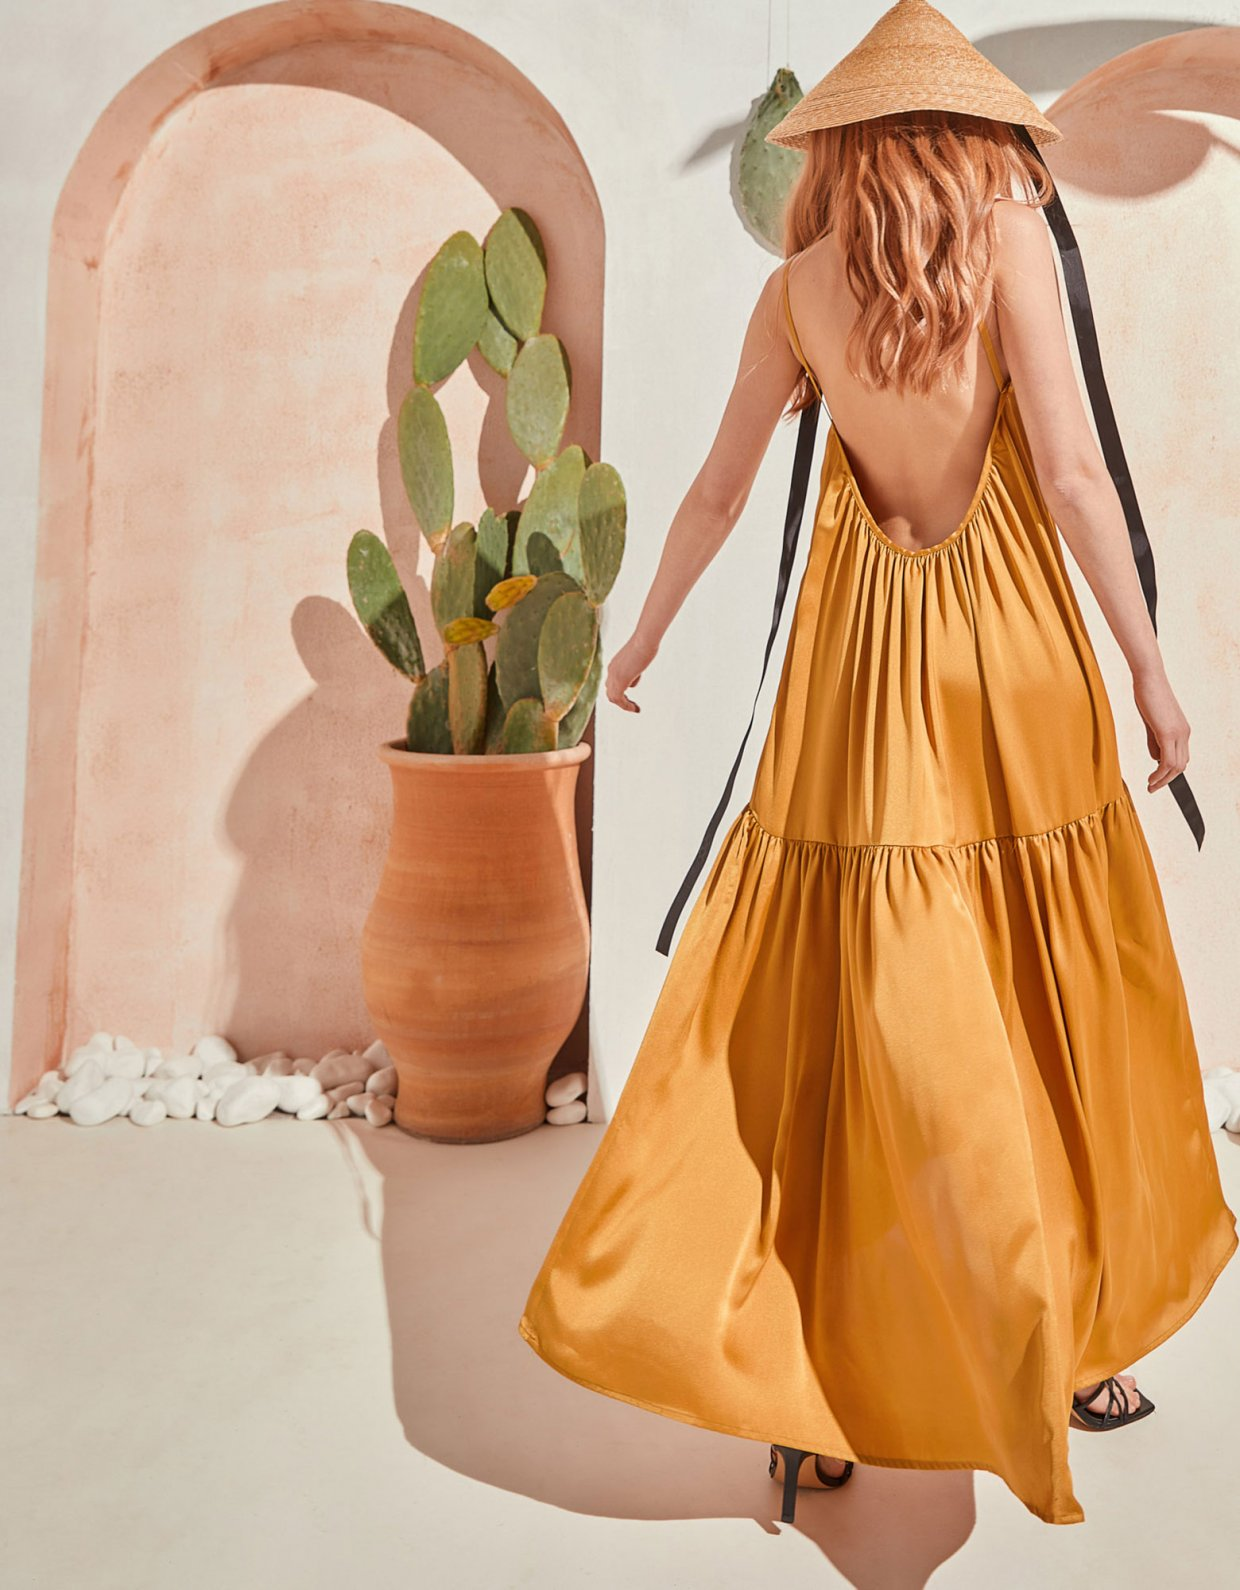 The Knl's Legacy dress aspen gold